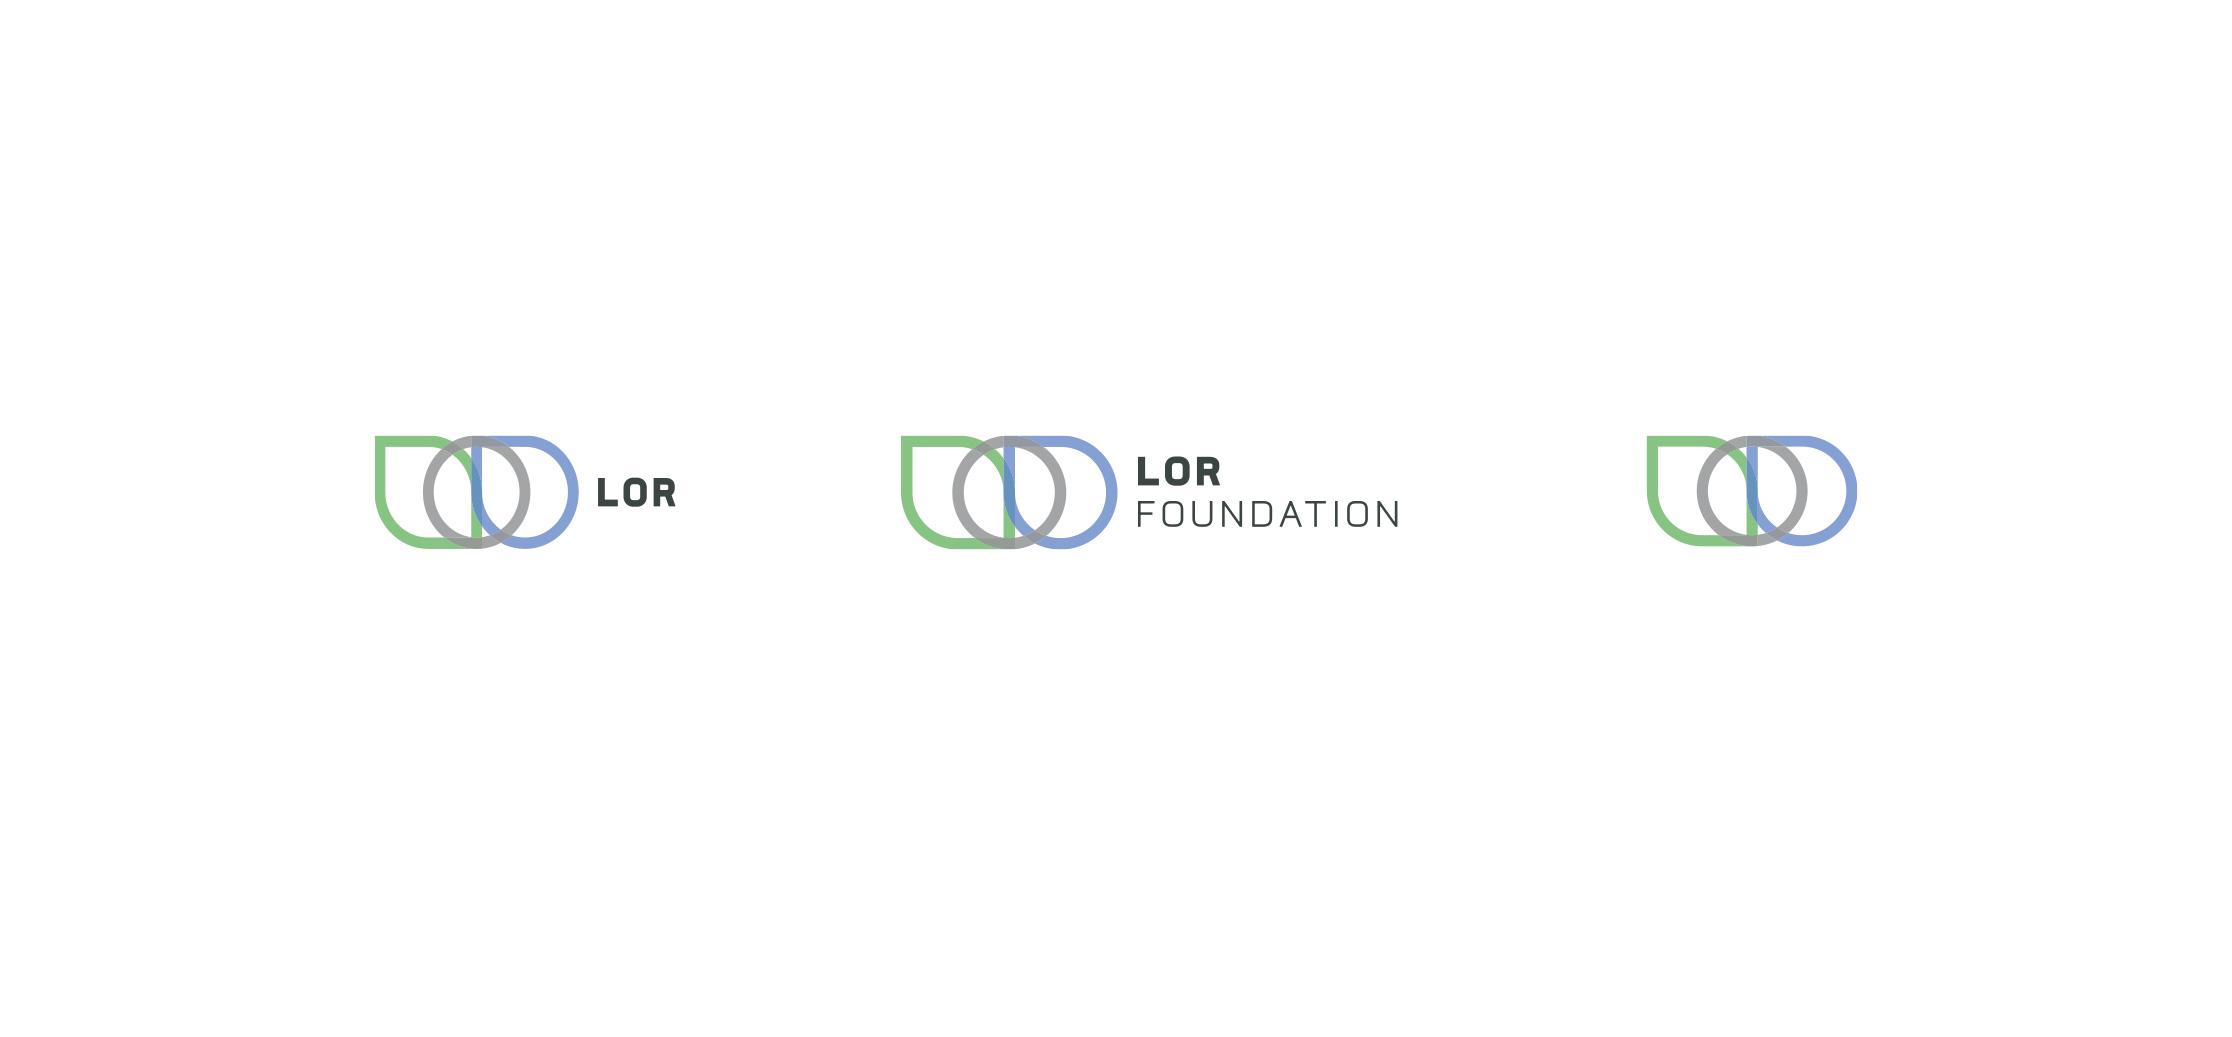 LOR Foundation | Mekanic